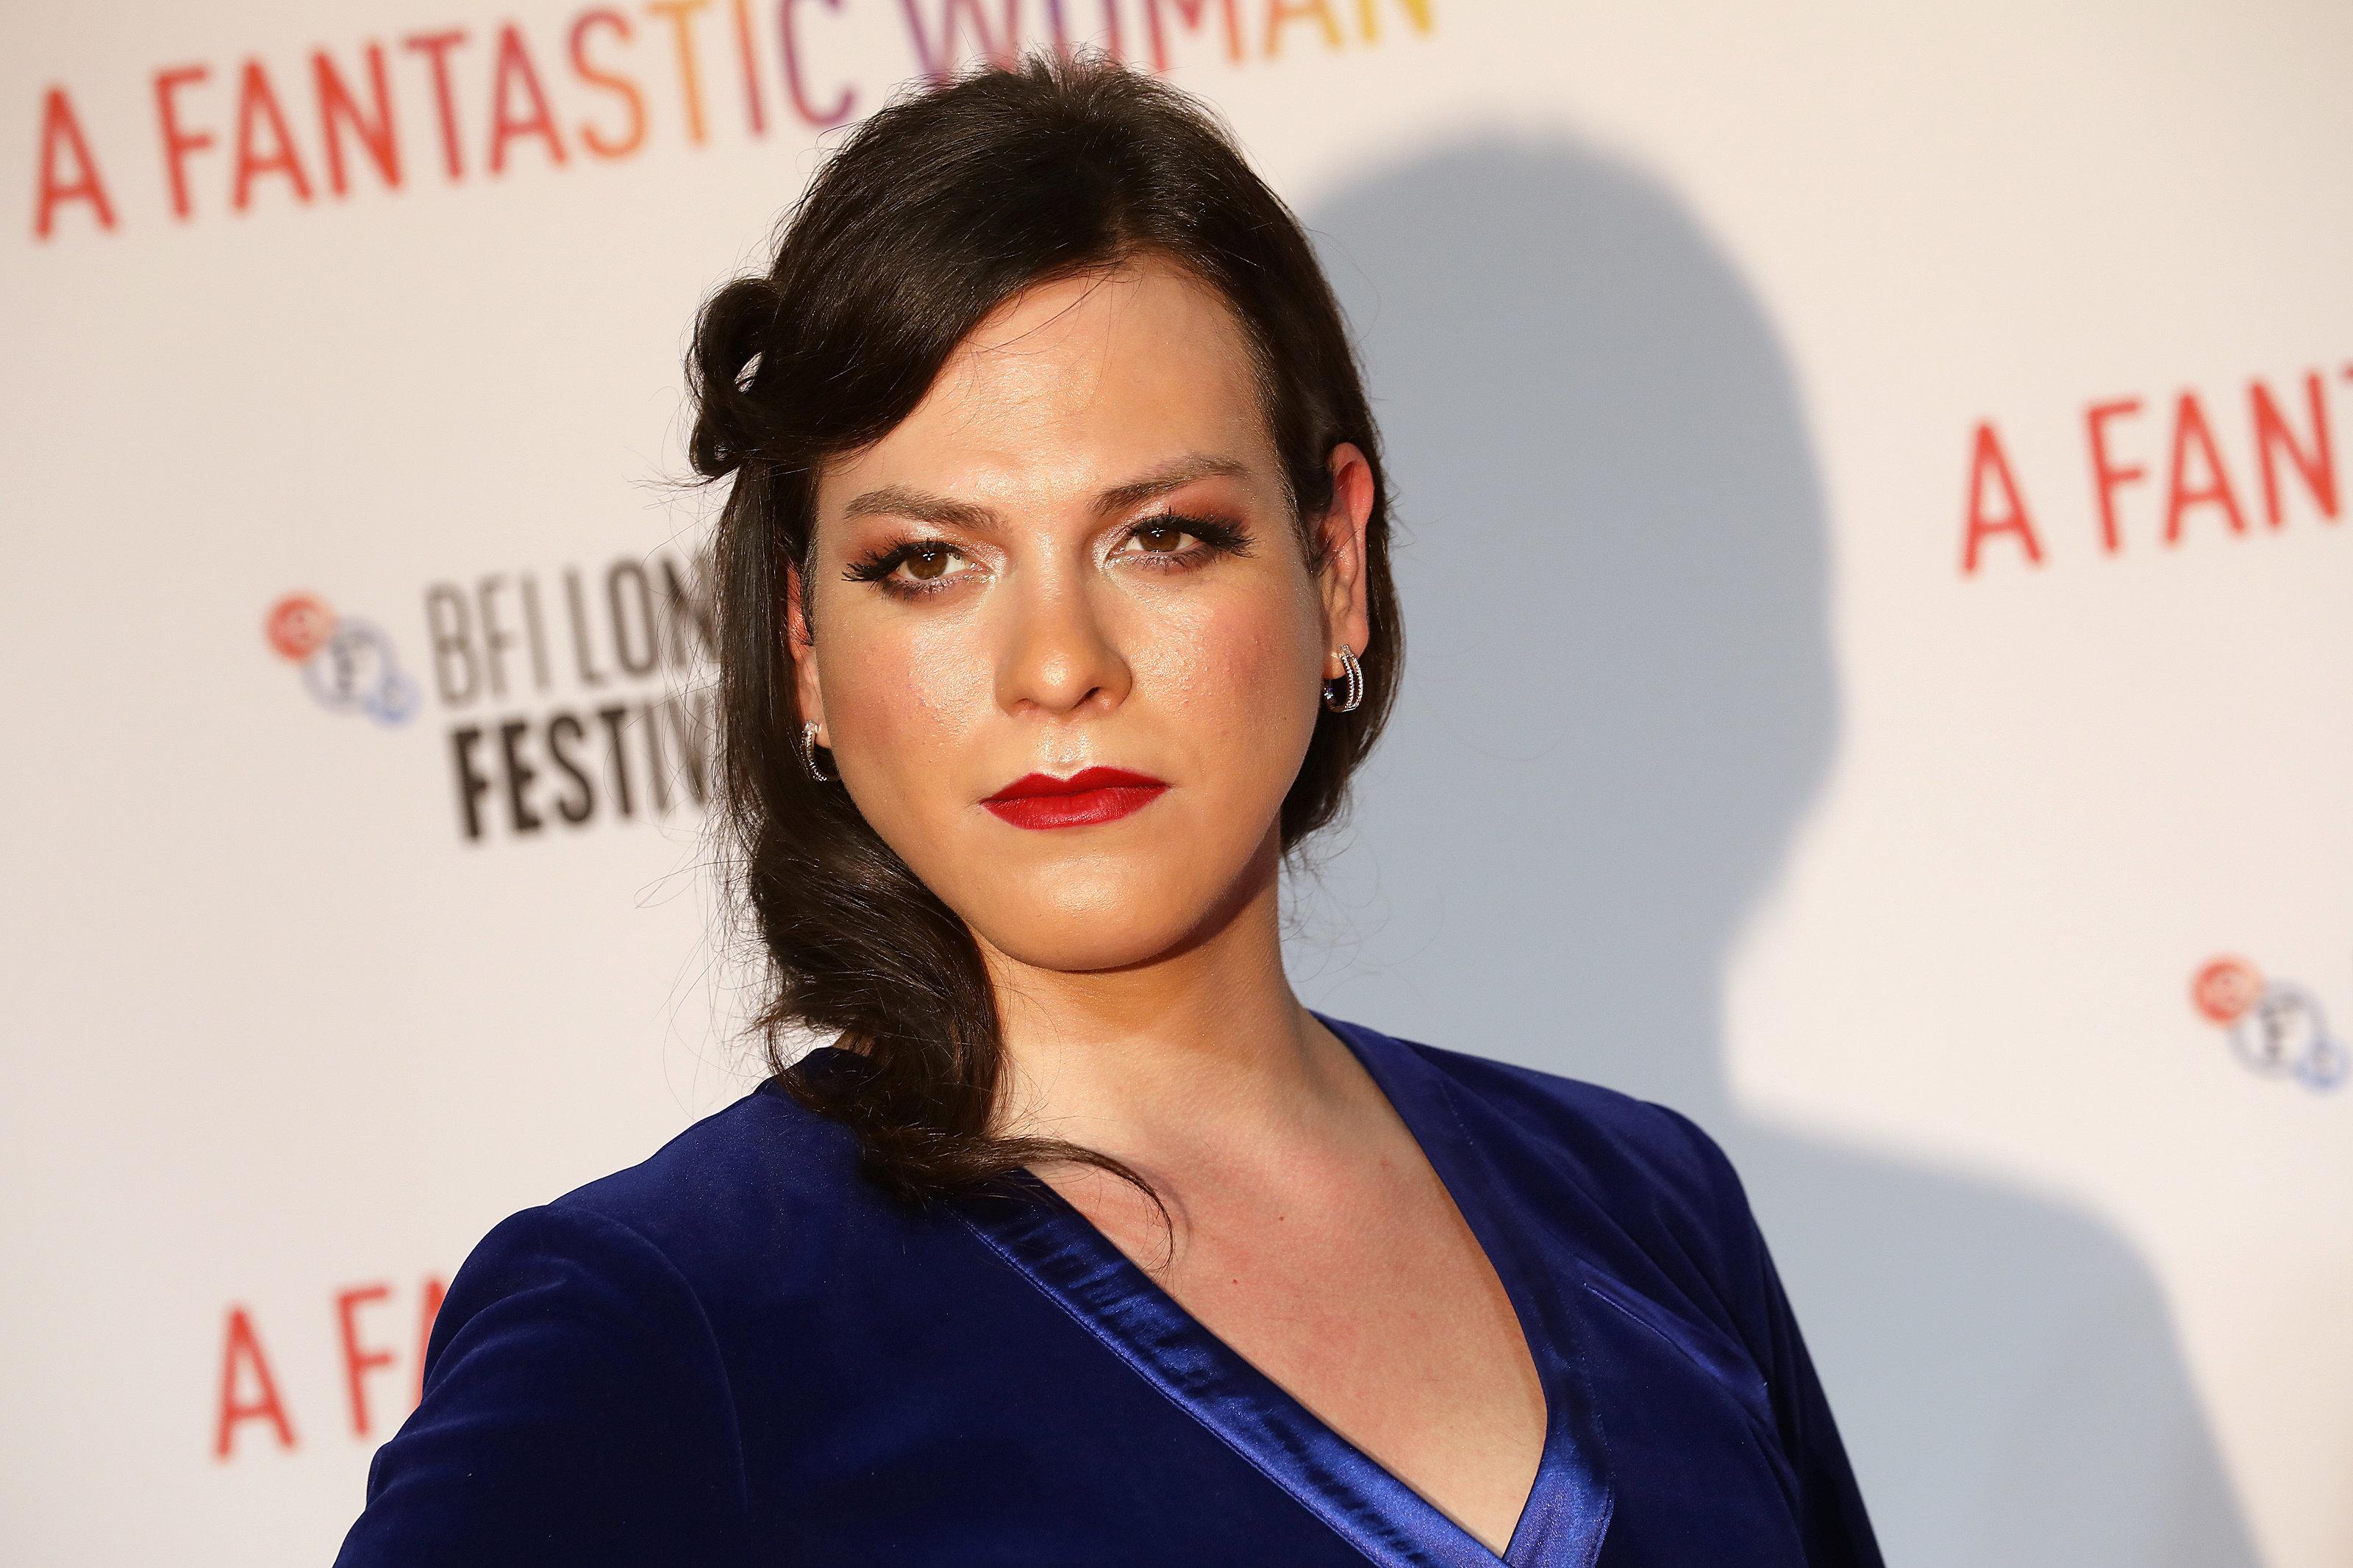 Daniela Vega To Be The Oscar's First Openly Transgender